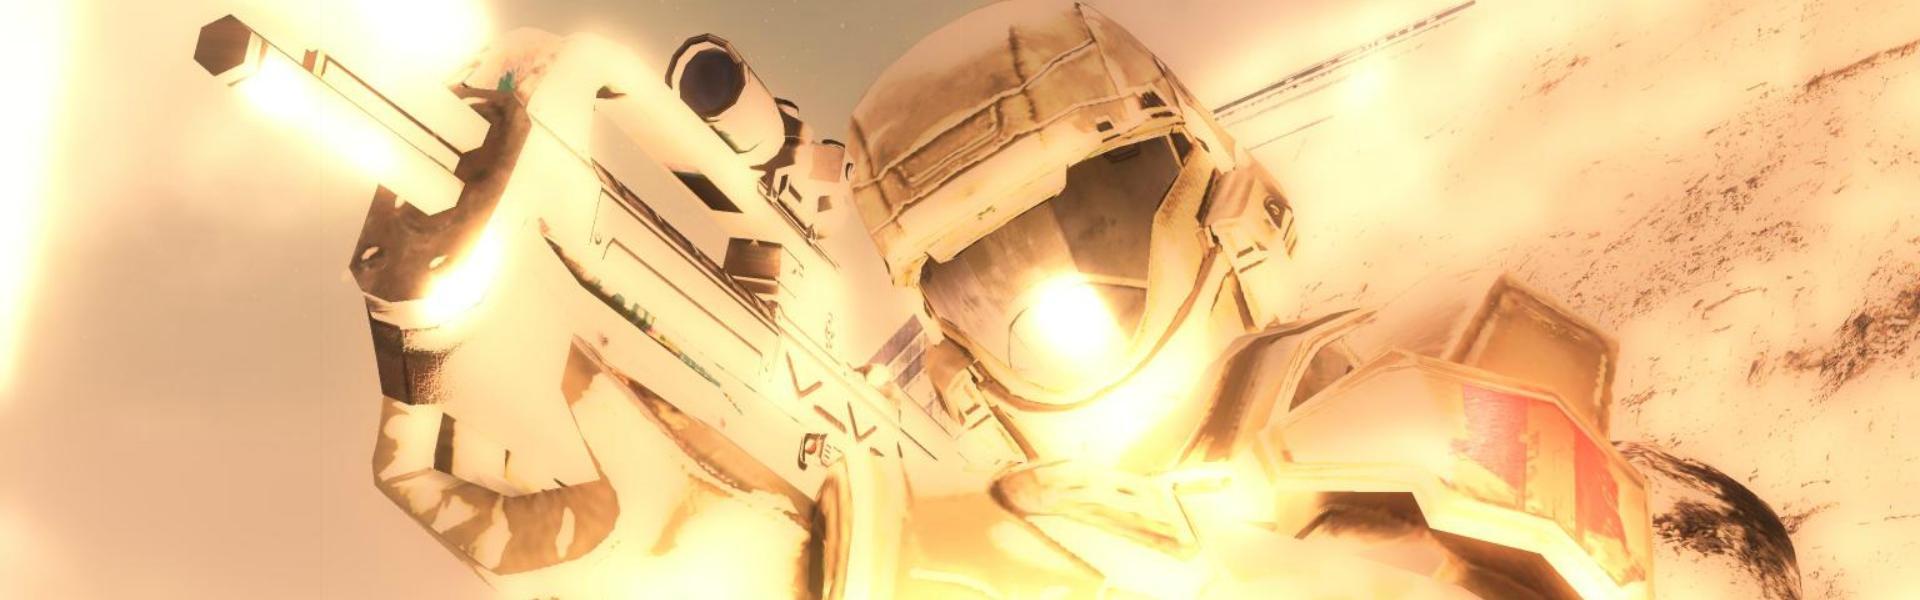 Happy Birthday, Halo 3: From ForgeHub | ForgeHub